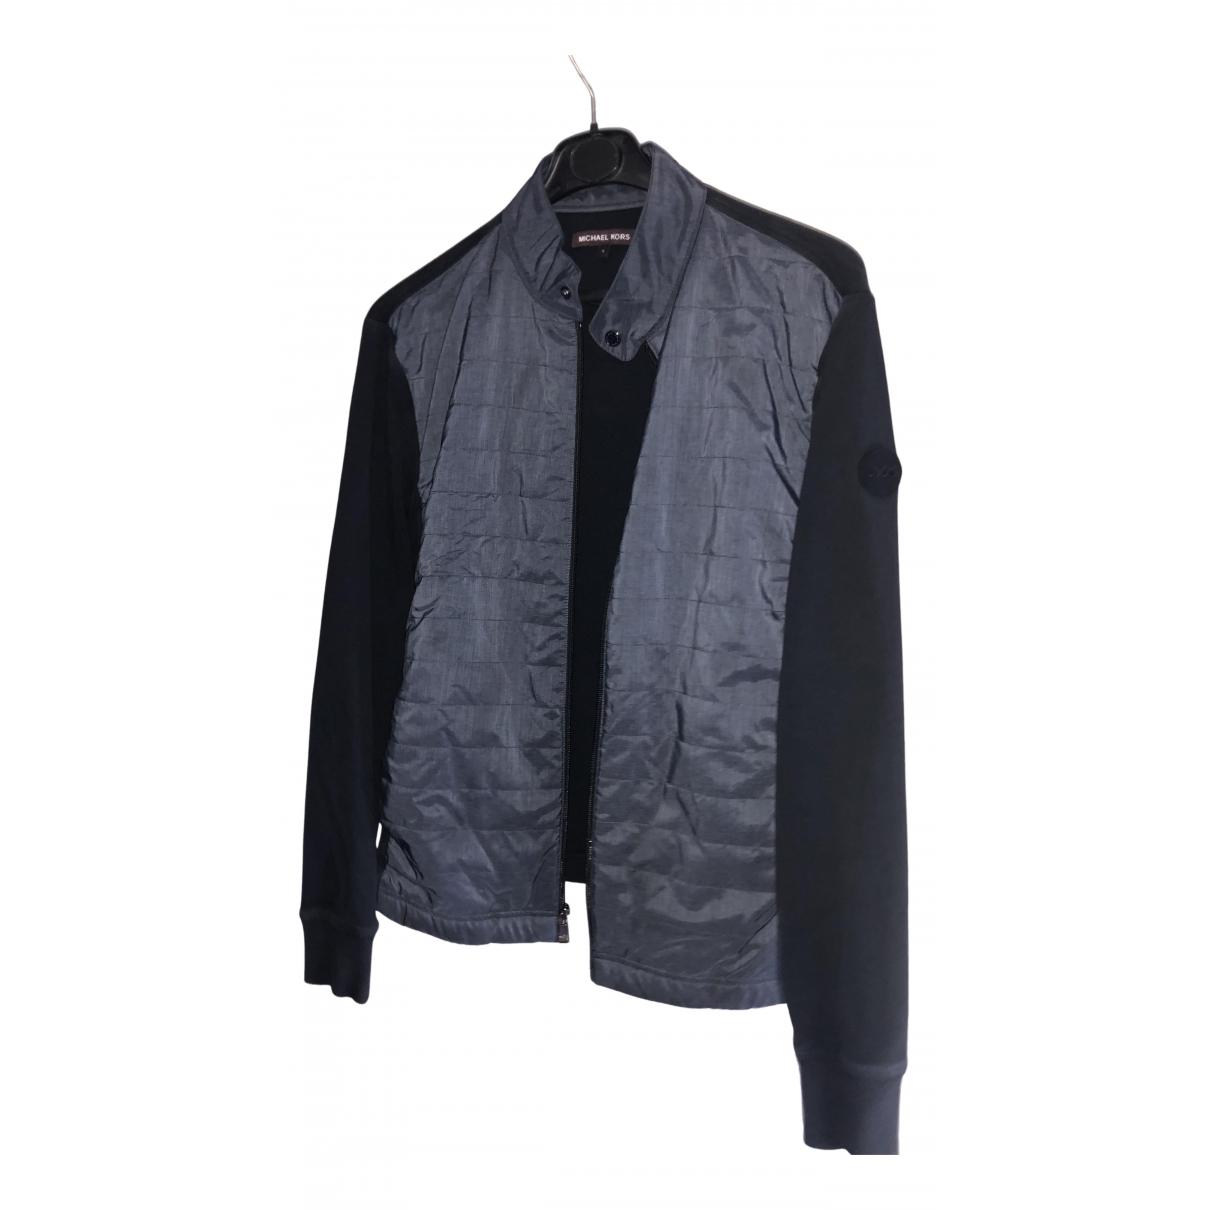 Michael Kors N Black Cotton Knitwear & Sweatshirts for Men S International